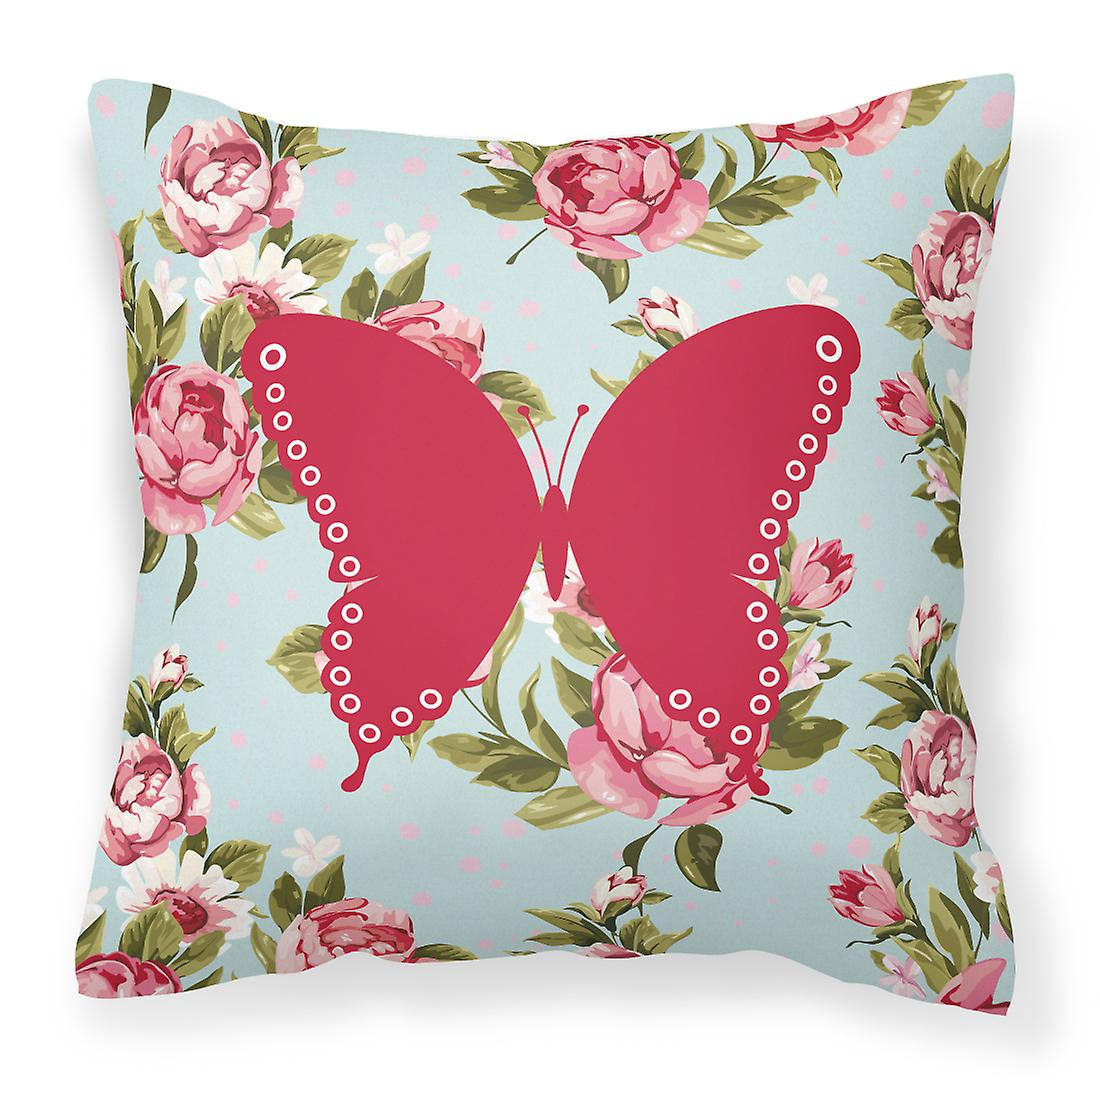 Roses Oreiller Bleu Décoratif Minable Chic Toile Papillons Bb1036 Tissu A4R35Lj